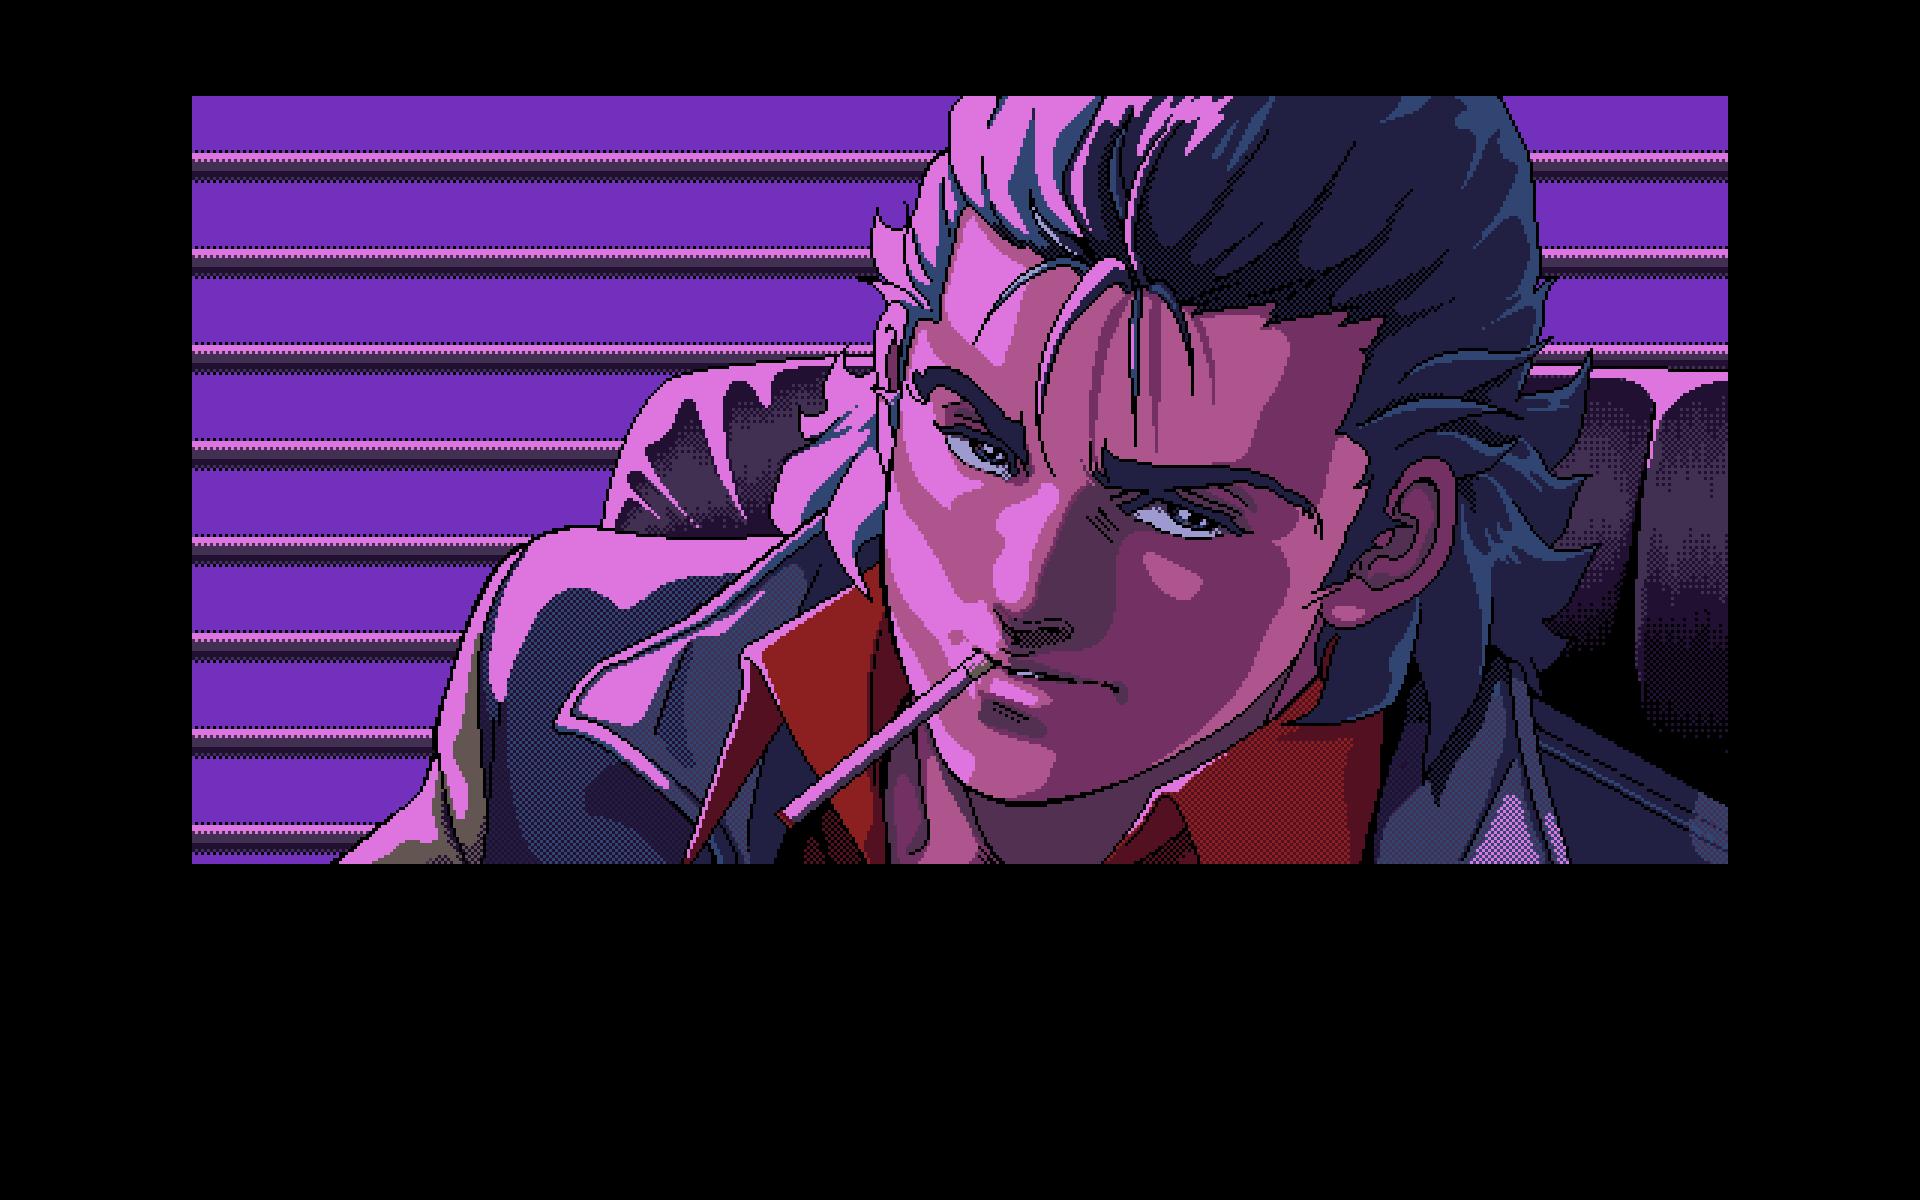 2019 Emulator Screenshot Thread: Piracy not included   ResetEra